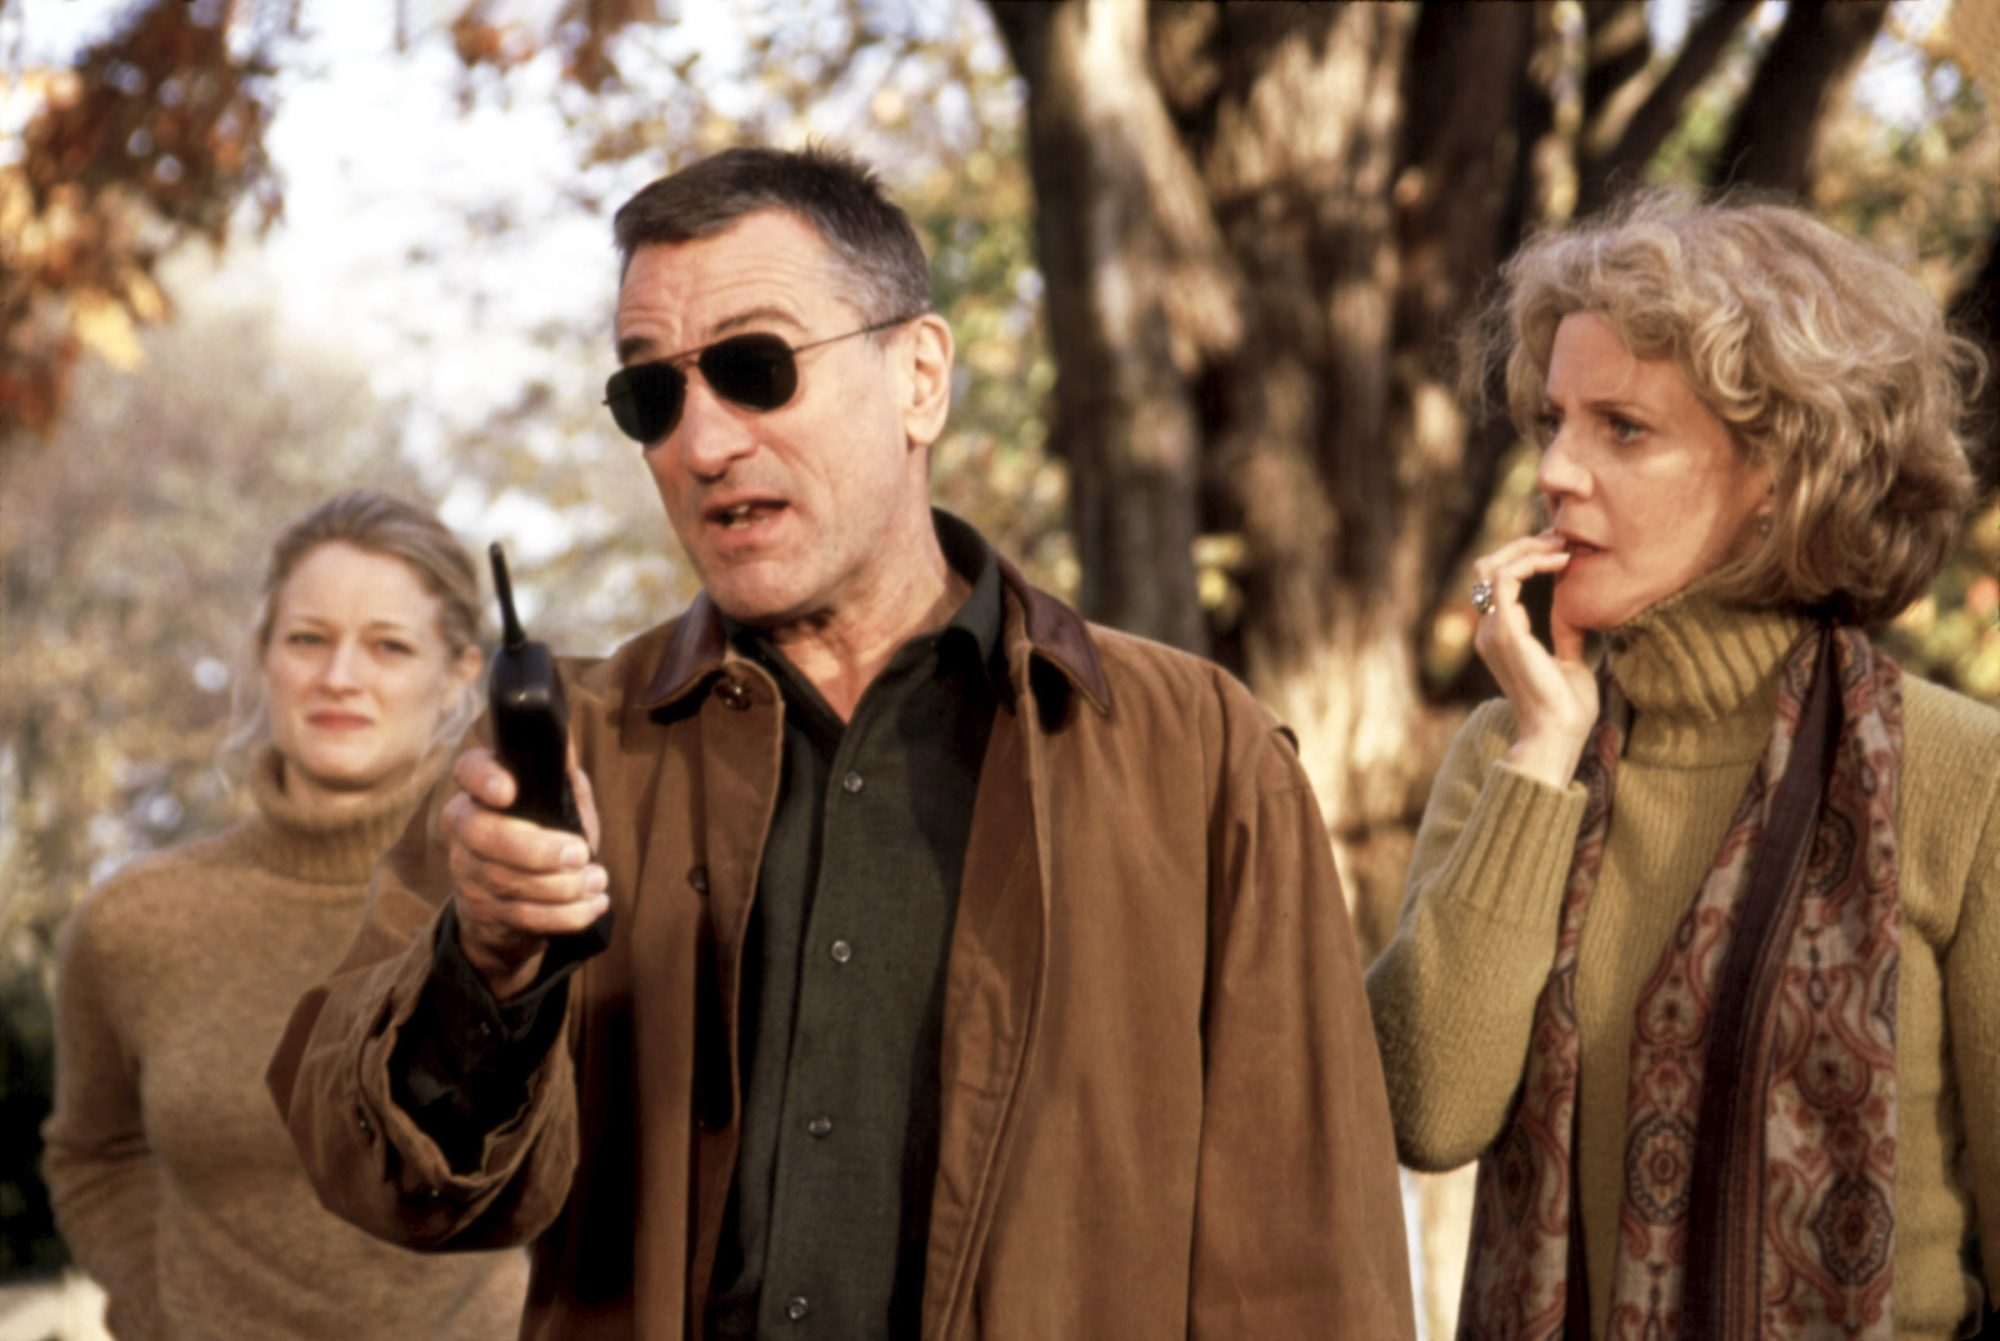 MEET THE PARENTS, Teri Polo, Robert De Niro, Blythe Danner, 2000